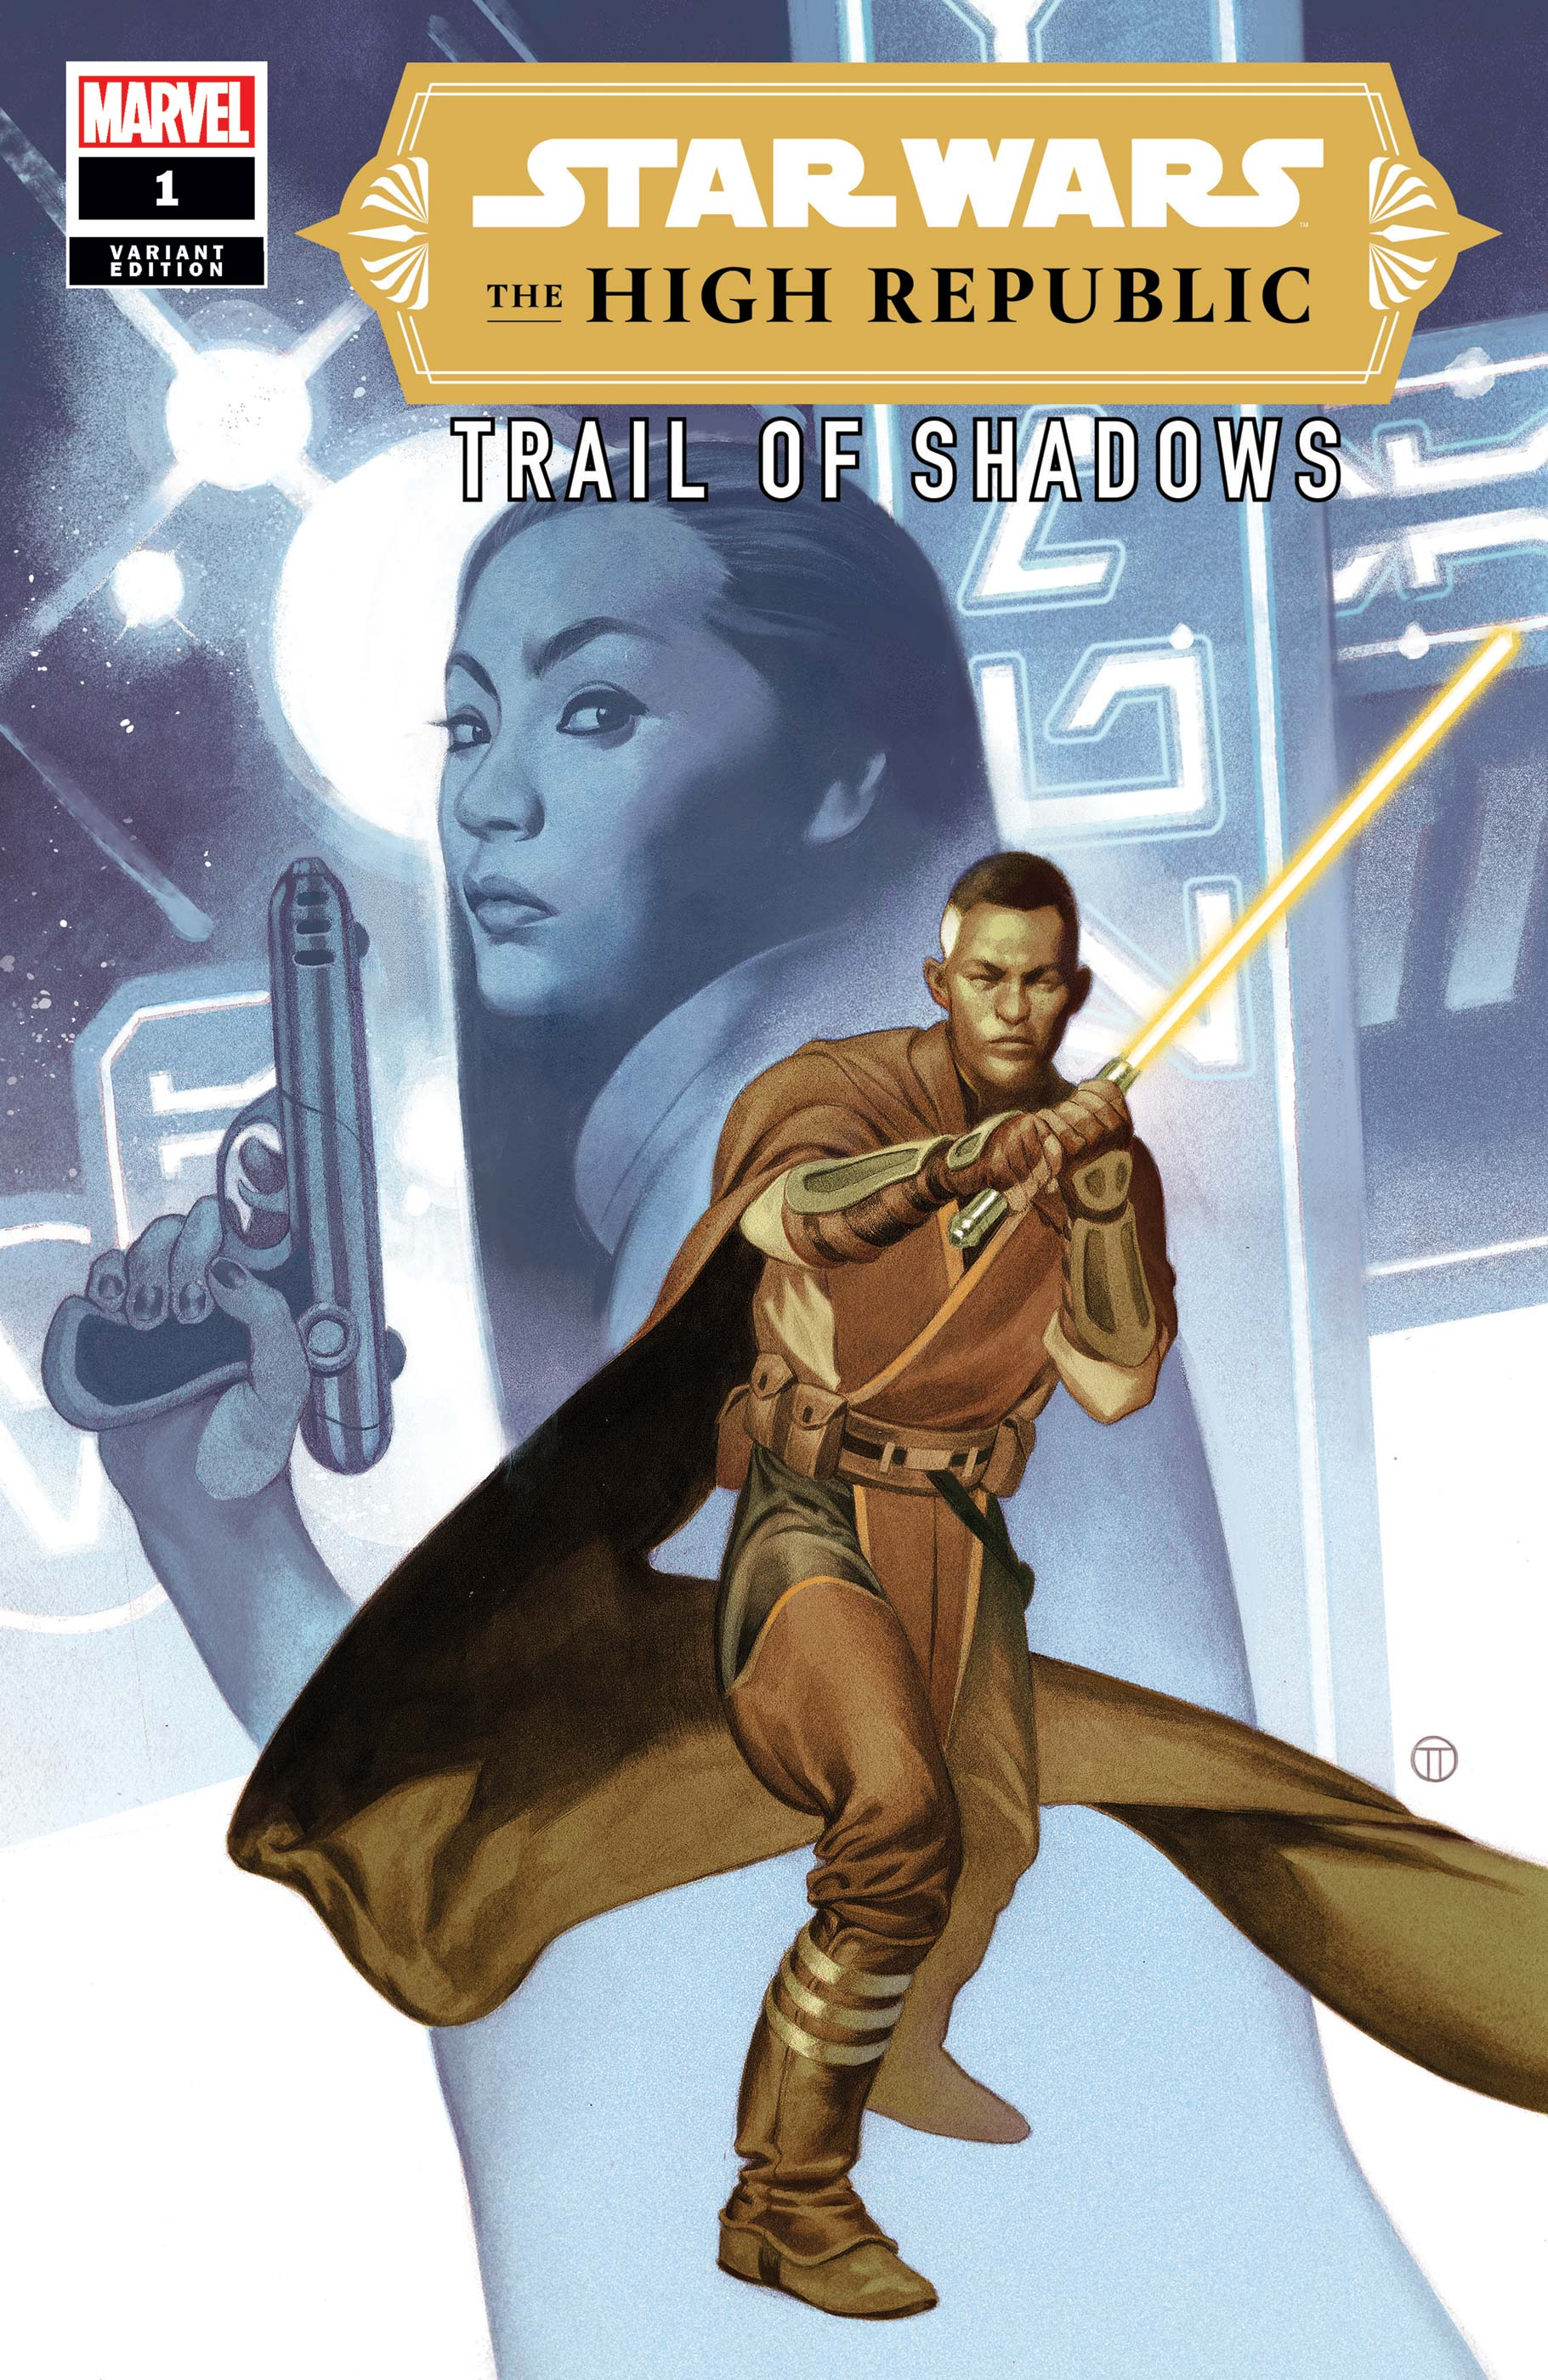 Star Wars: The High Republic - Trail of Shadows (2021) #1 (Variant)